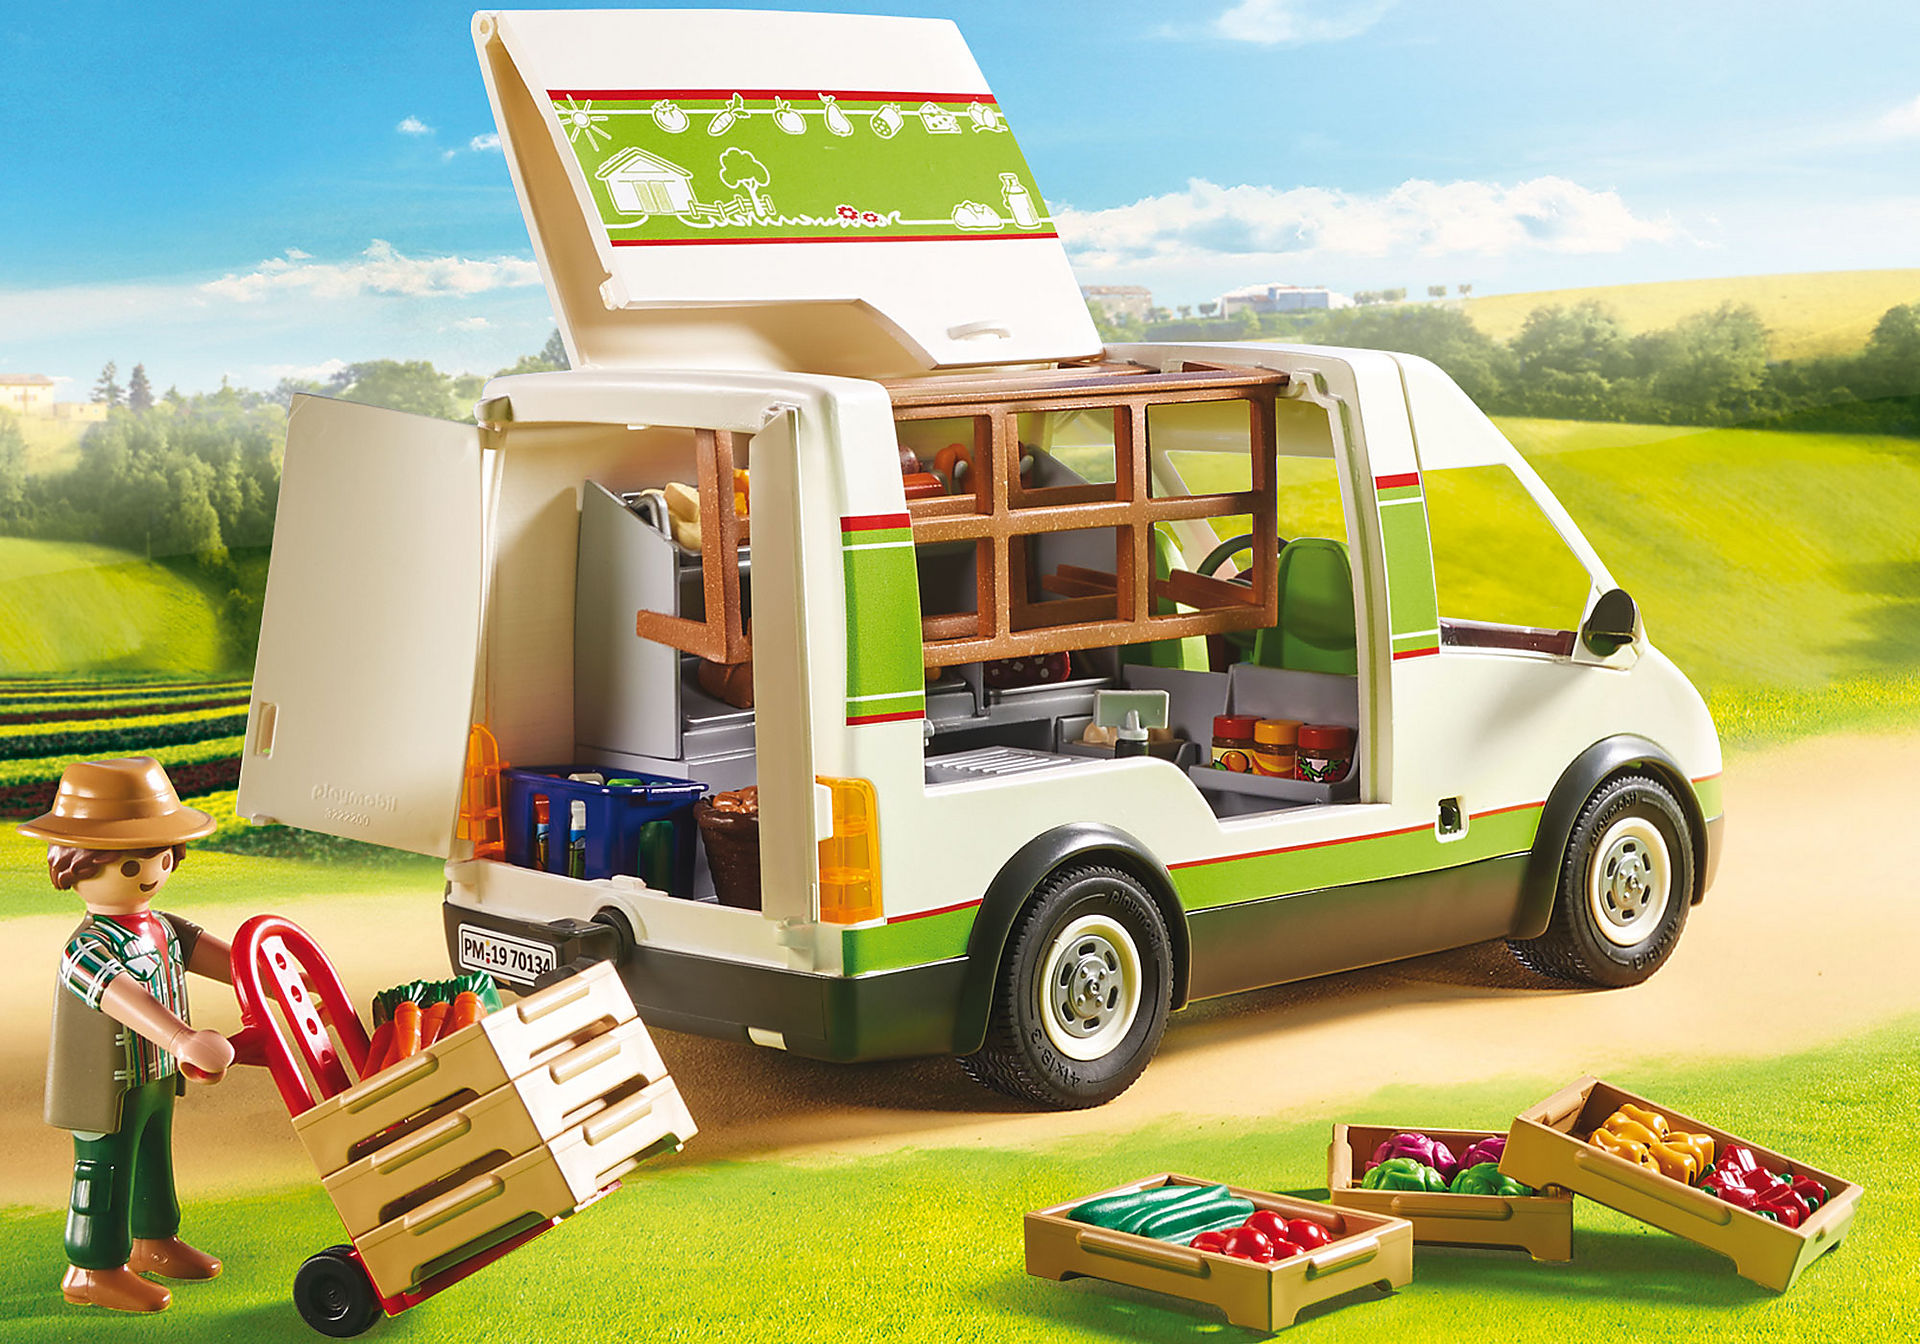 70134 Marktkraamwagen zoom image4